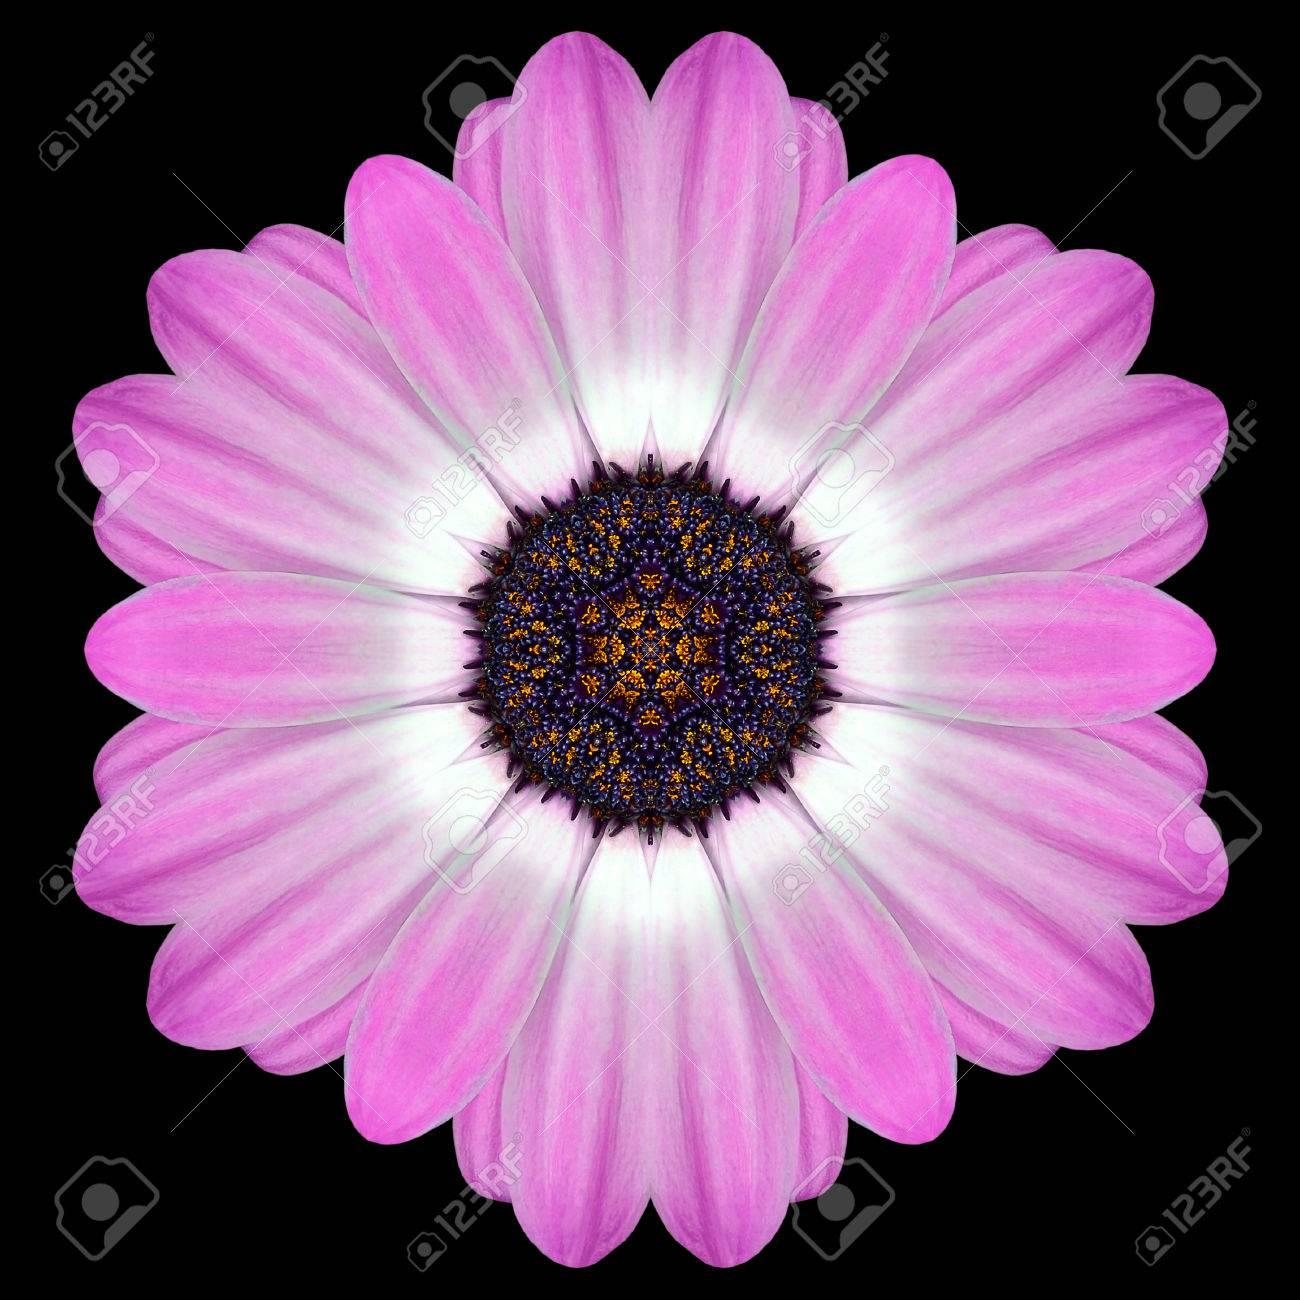 Pink Purple Mandala Of Daisy Flower With Dark Center Kaleidoscopic